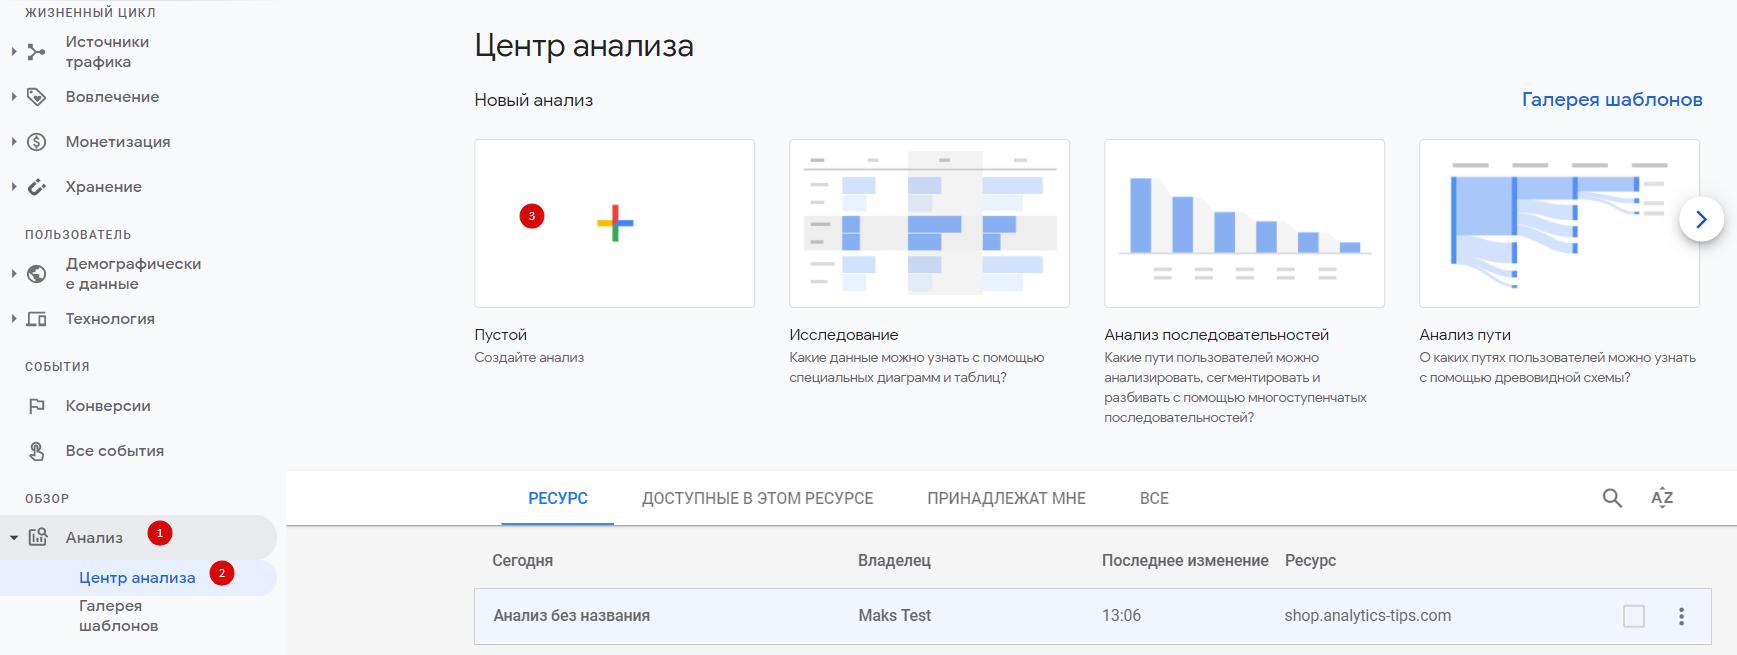 Создание анализа в Центре анализа в Google Analytics 4